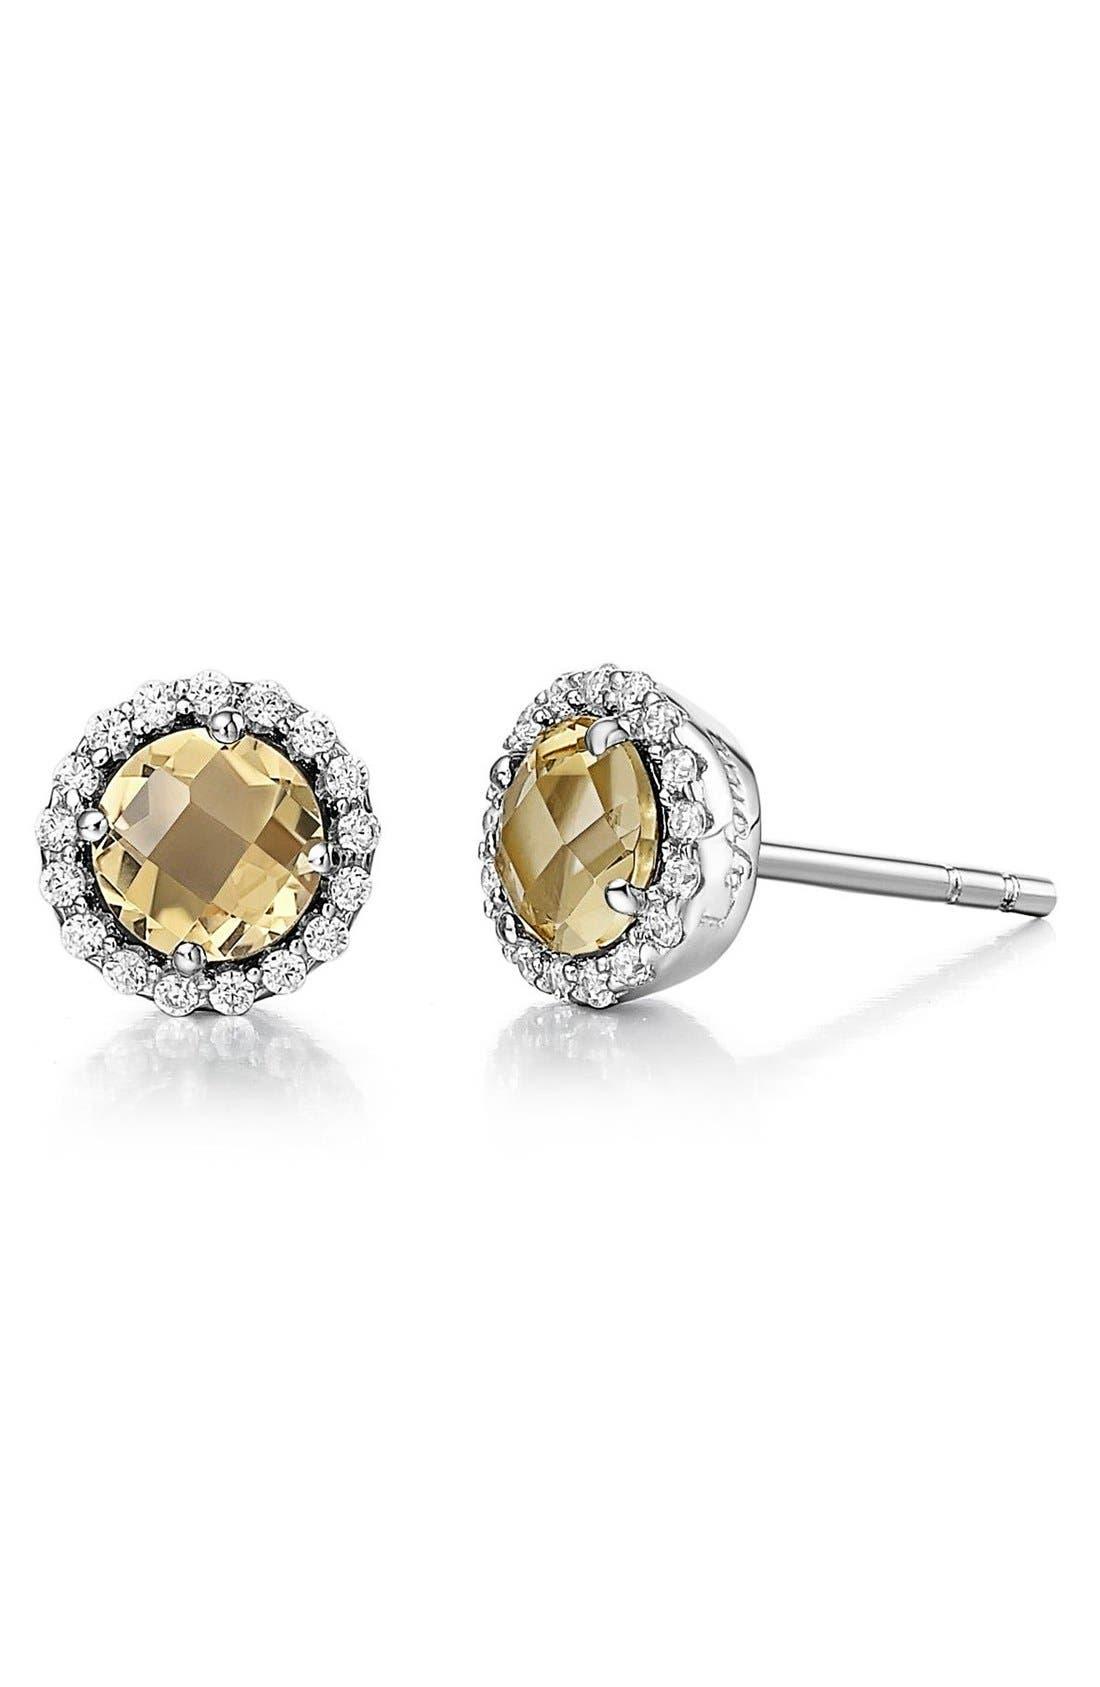 Alternate Image 1 Selected - Lafonn Birthstone Stud Earrings